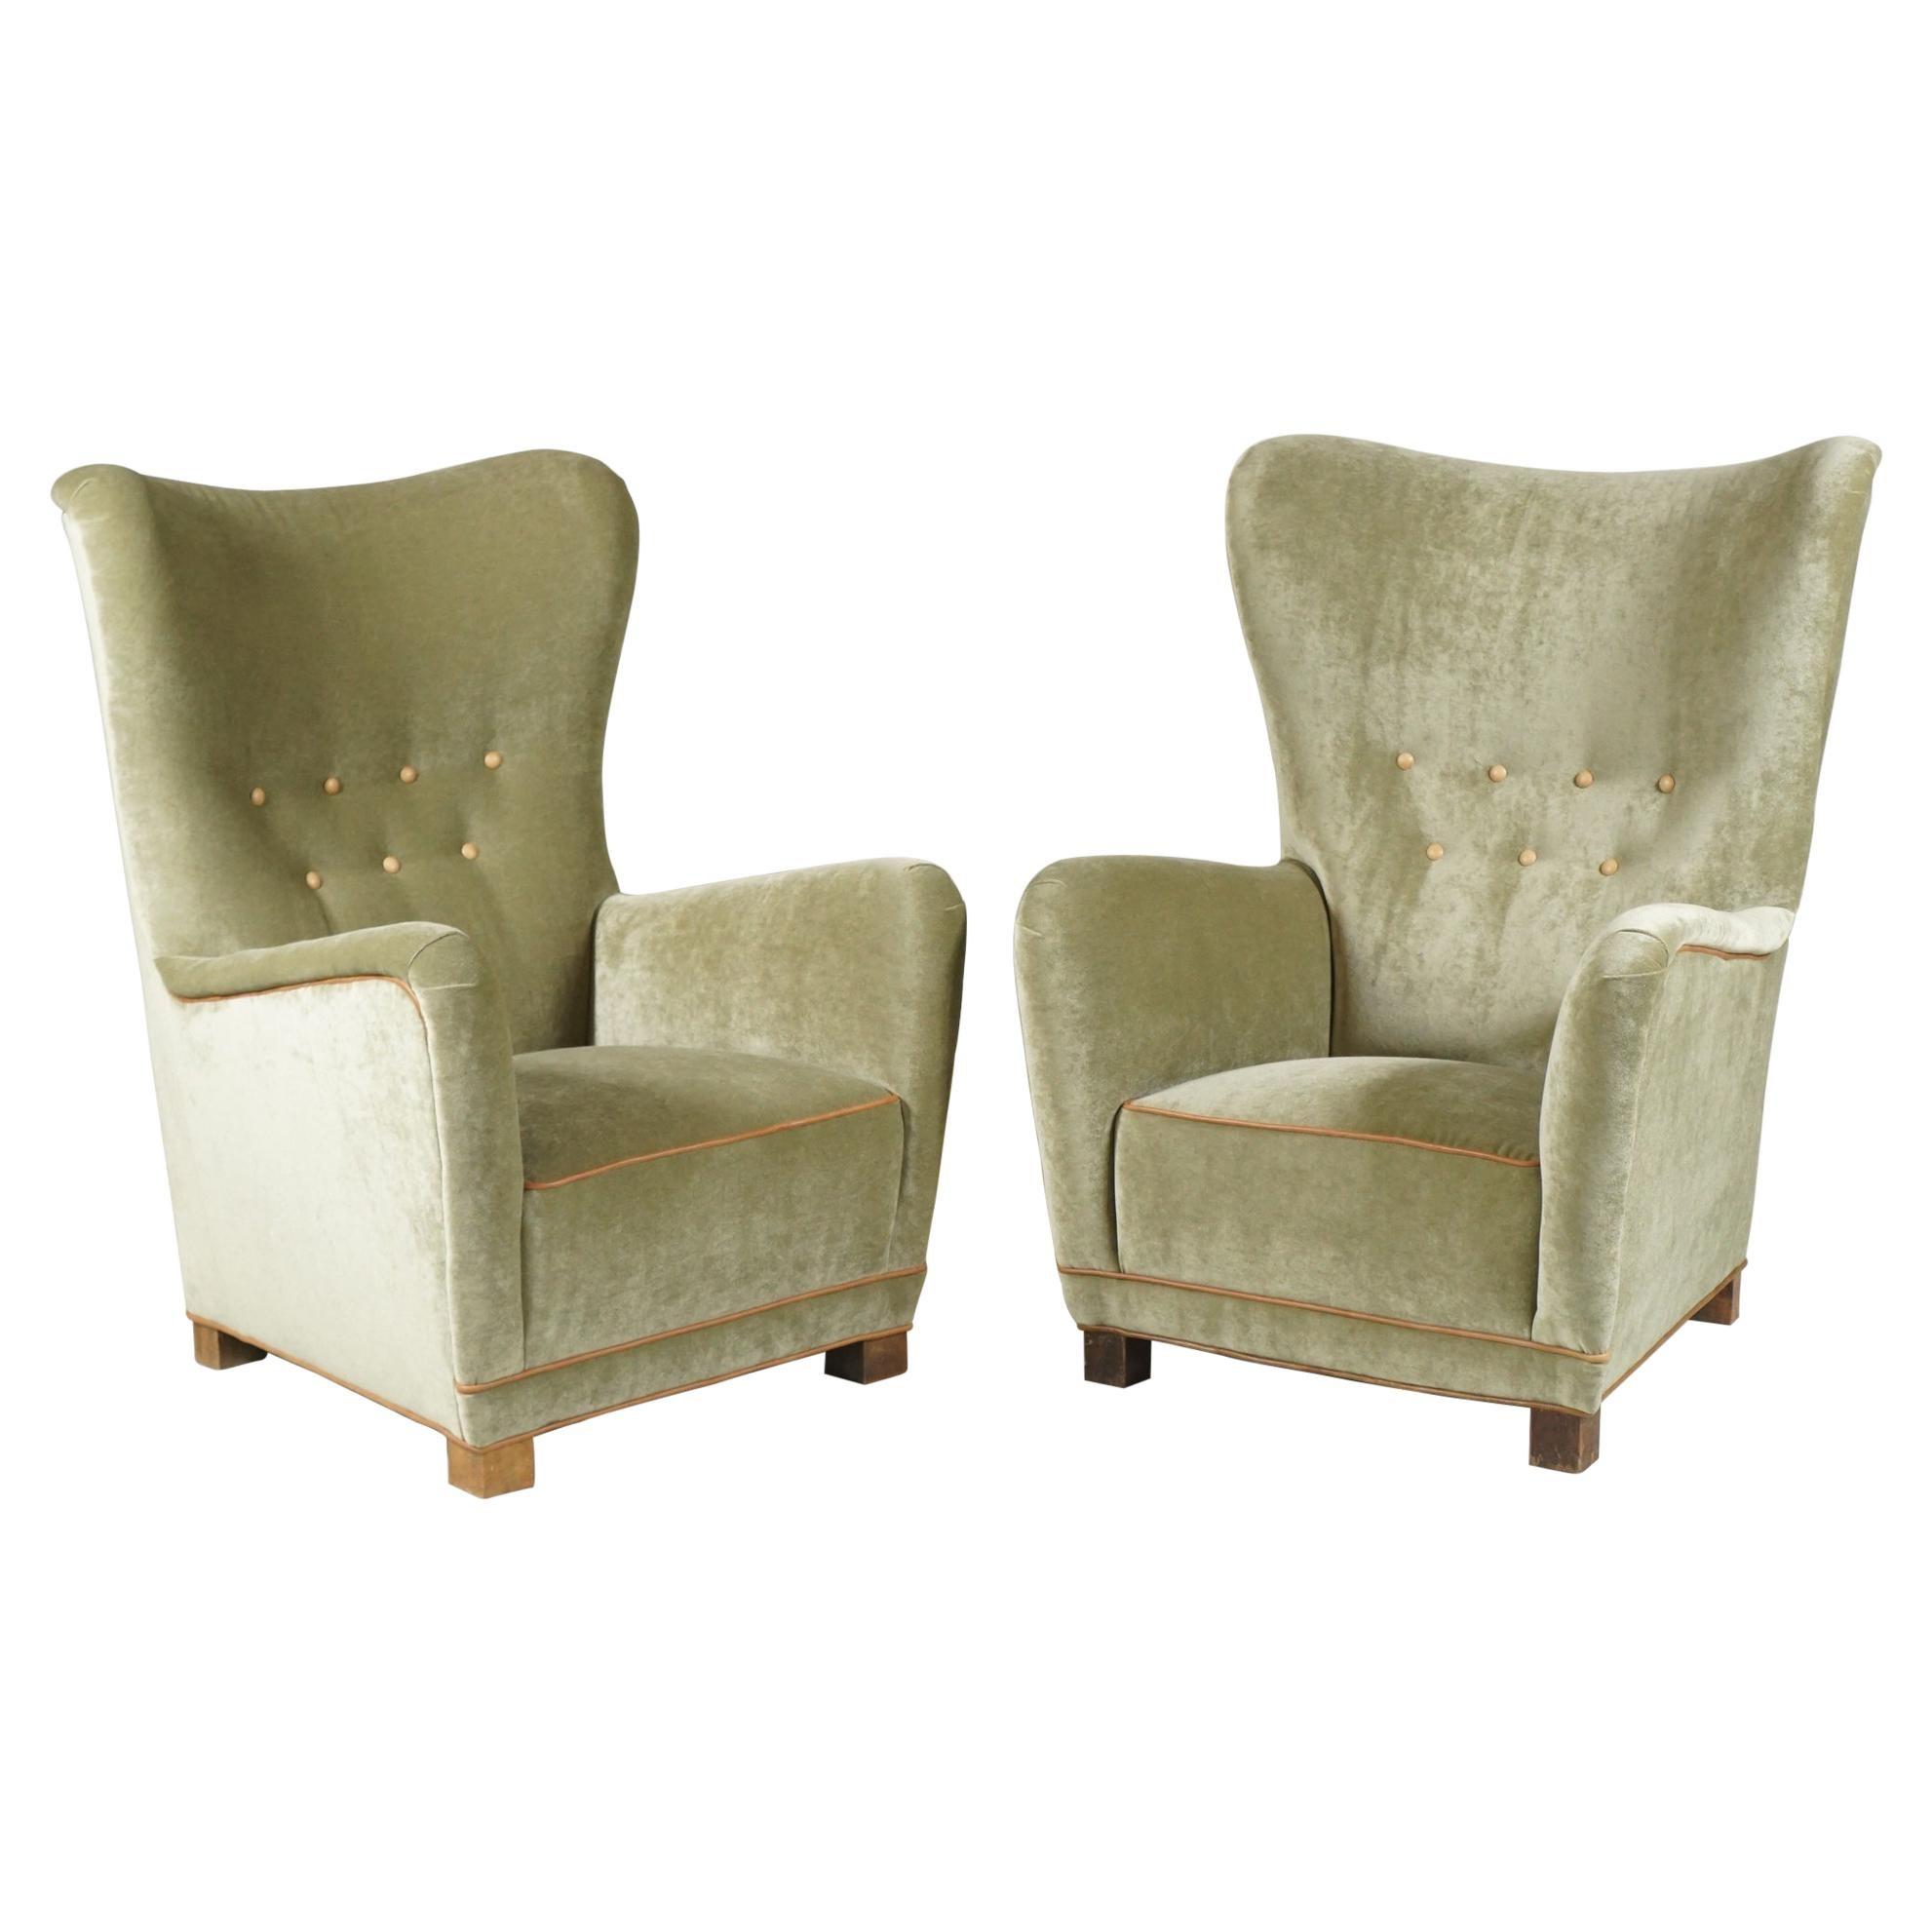 Pair of Green Armchairs by Fritz Hansen